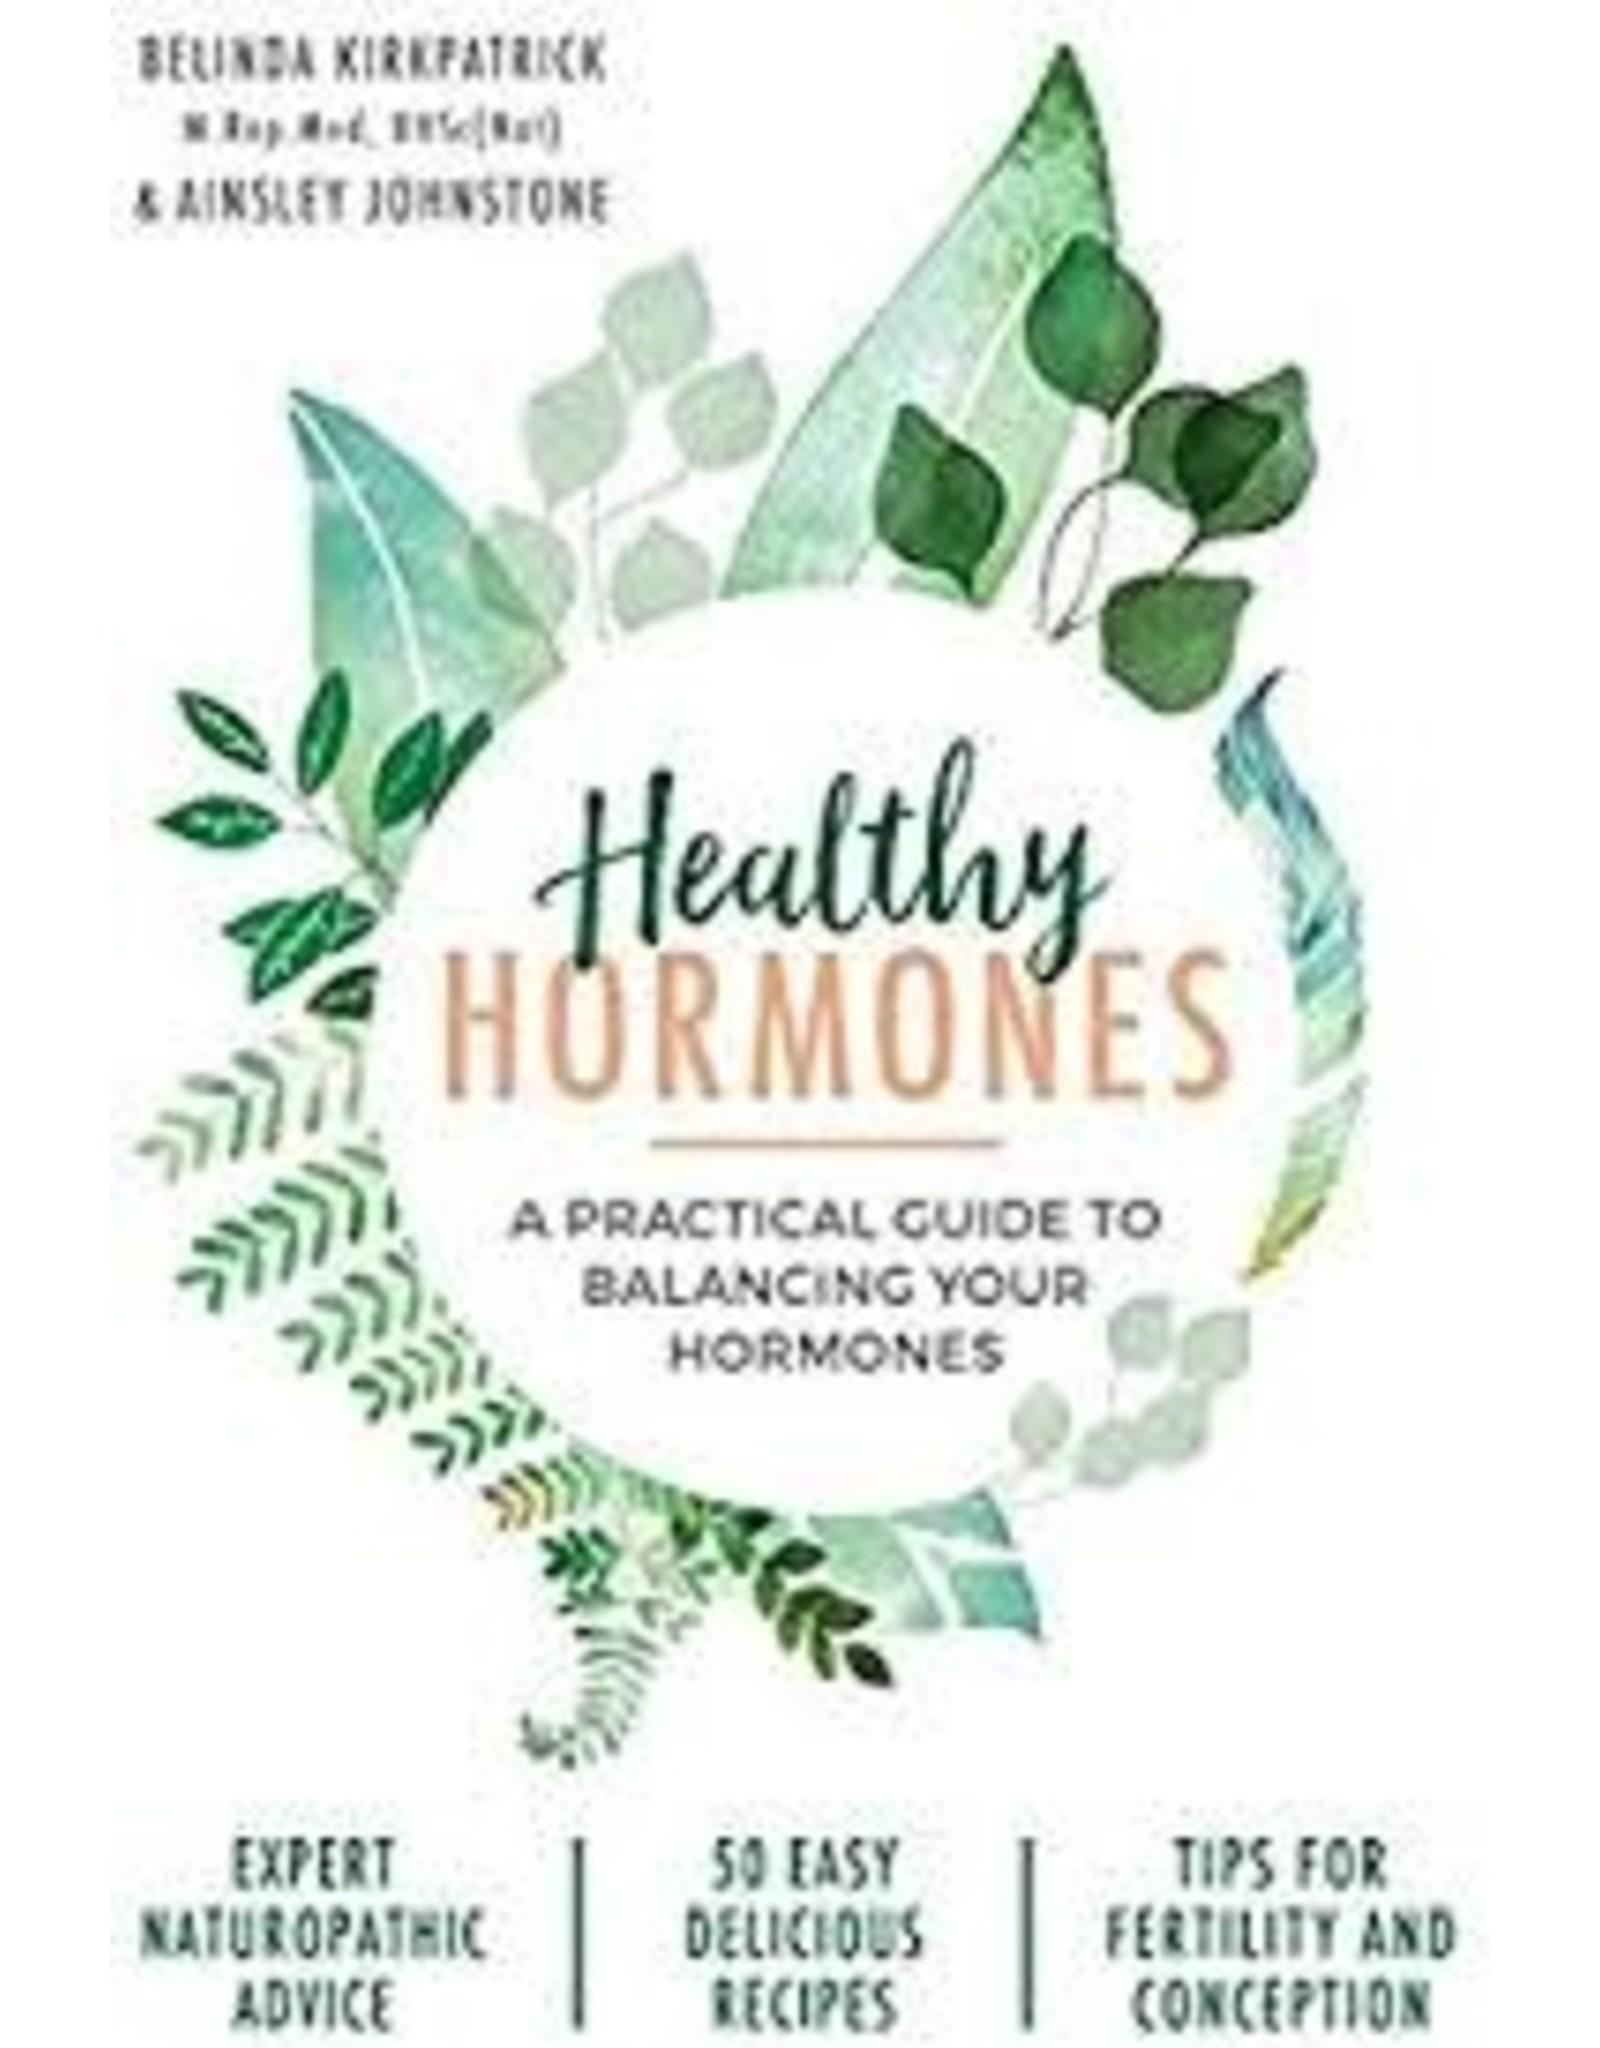 Healthy Hormones Belinda Kirkpatrick & A Johnstone - Book